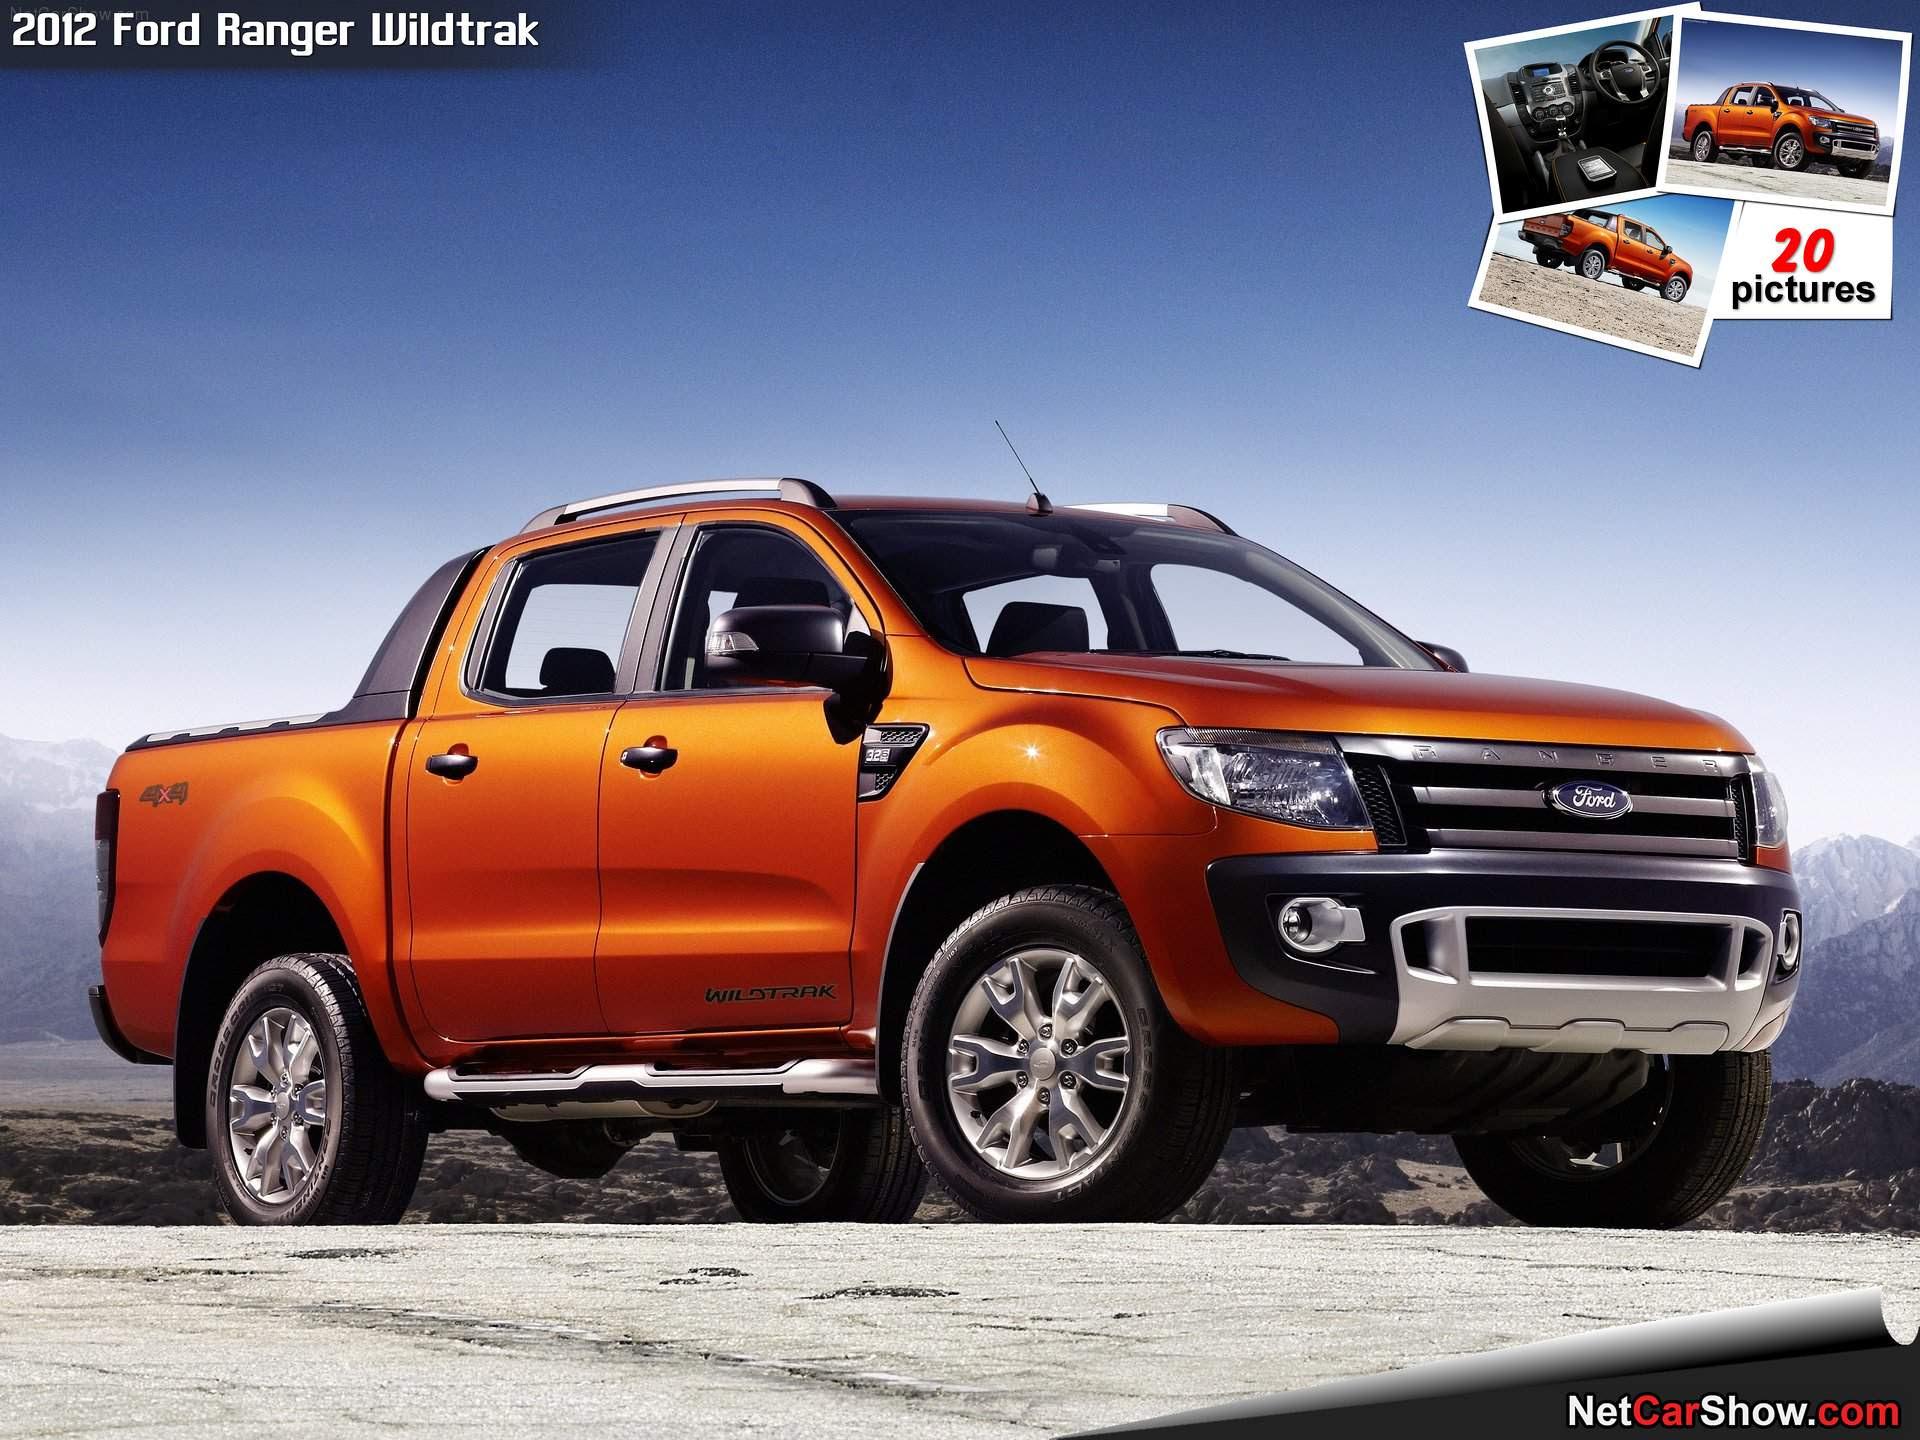 Ford Ranger Wildtrak (2012)